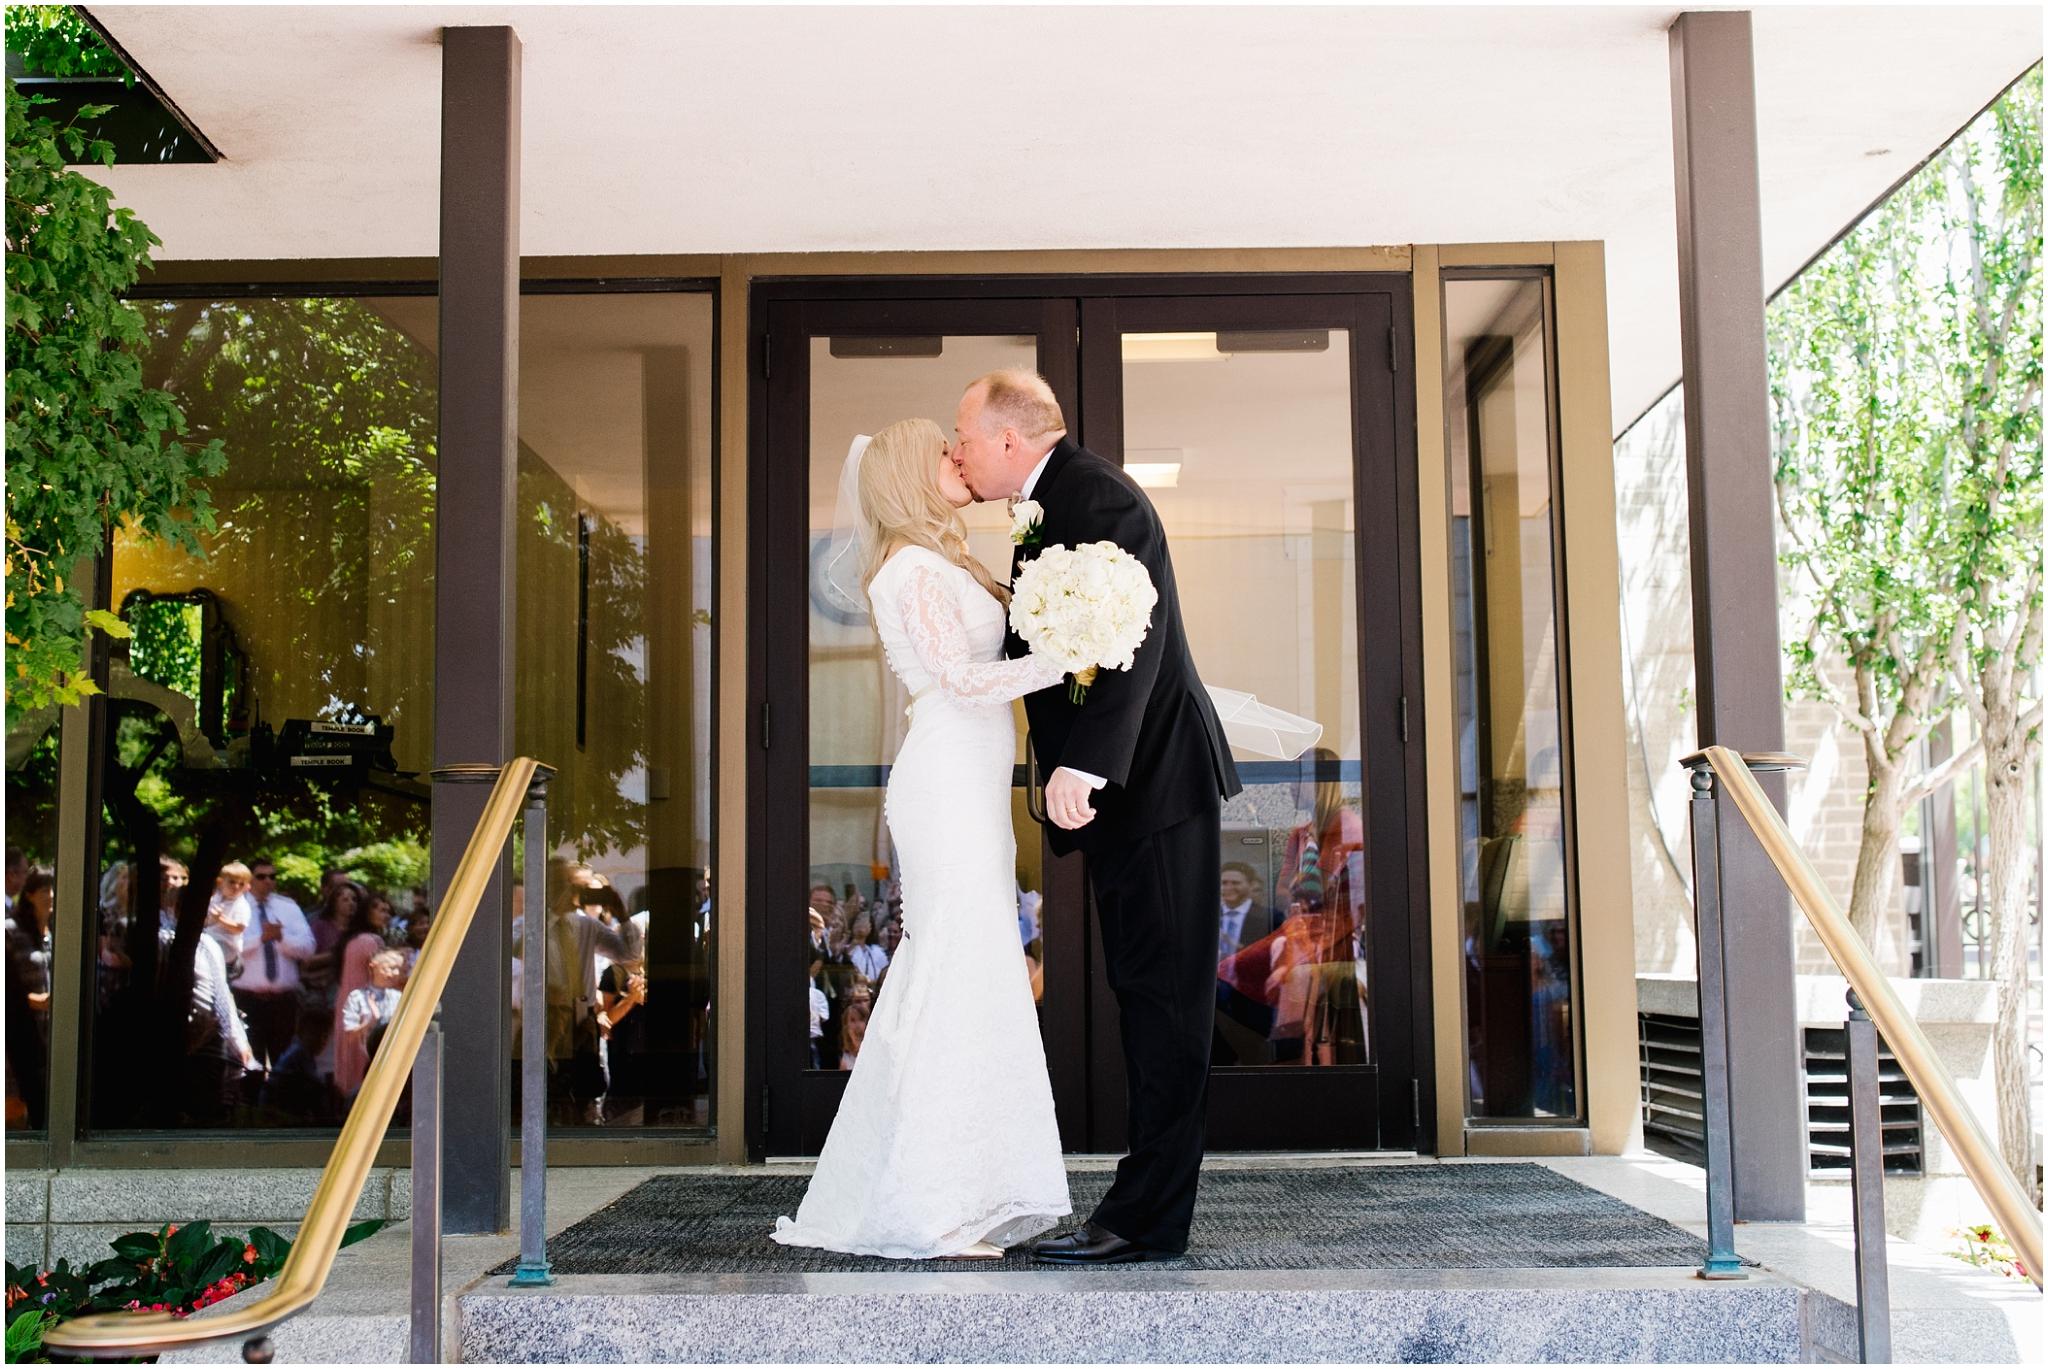 CherylandTyler-3_Lizzie-B-Imagery-Utah-Wedding-Photographer-Salt-Lake-City-Temple-Wells-Fargo-Building-Reception.jpg